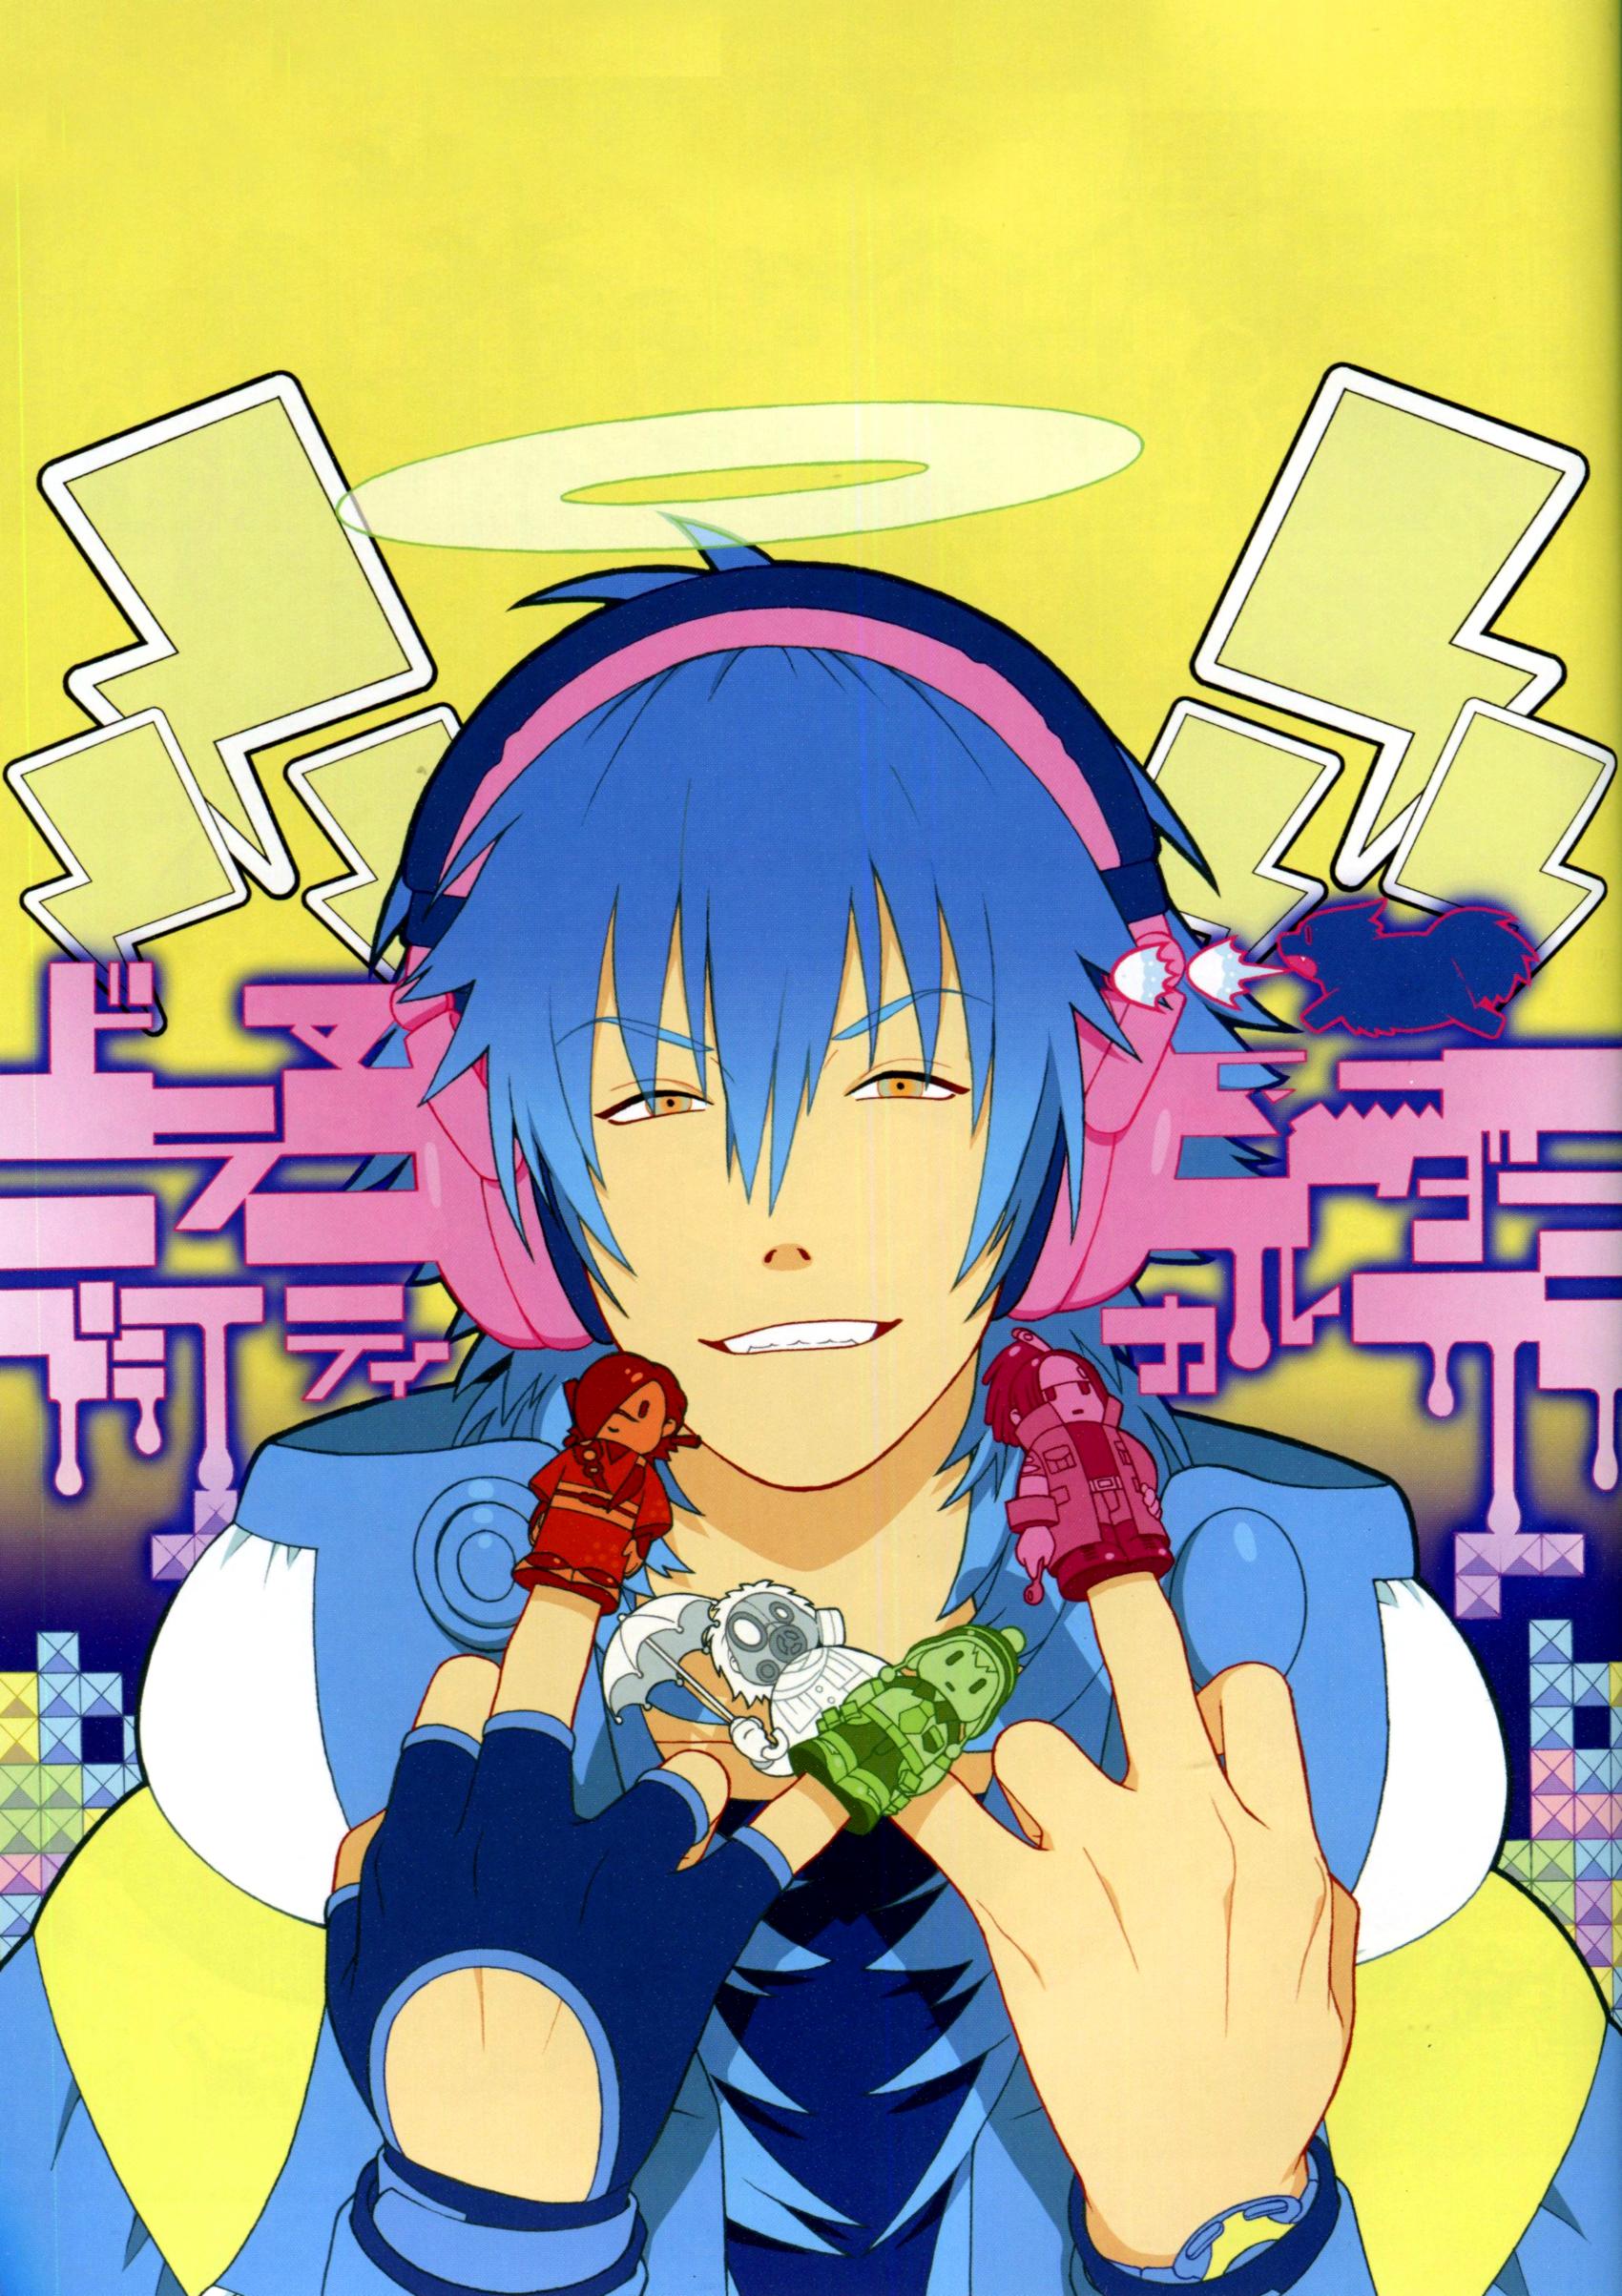 DRAMAtical Murder Image #1186312 - Zerochan Anime Image Board